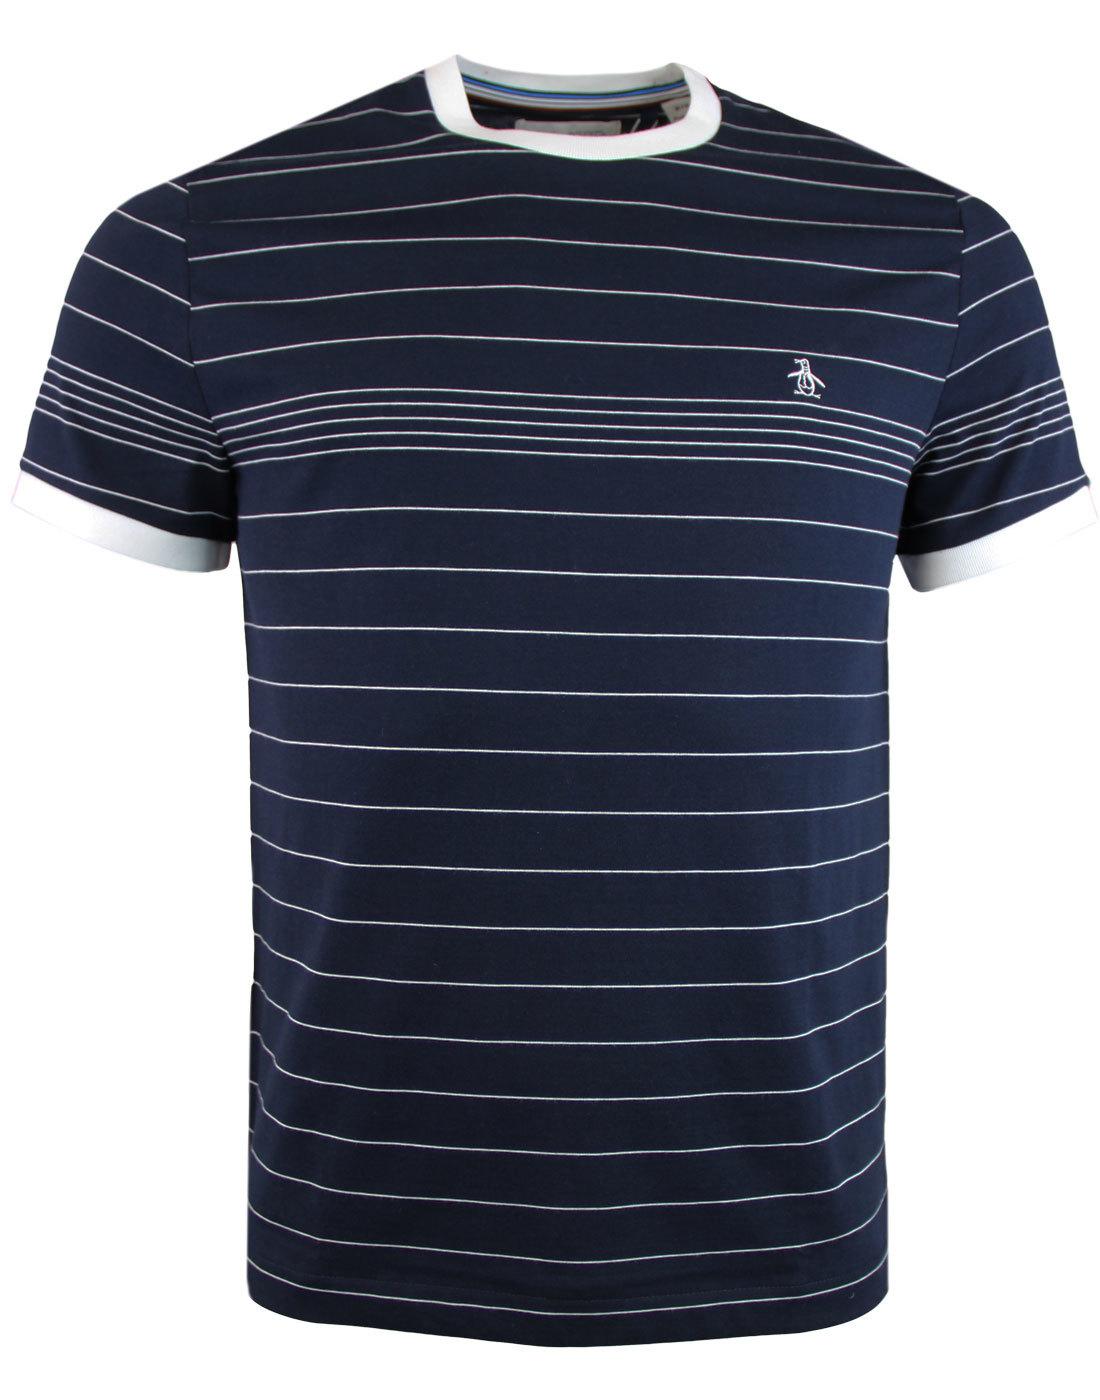 e9333061430 ORIGINAL PENGUIN Mens Retro Indie Striped T-Shirt In Sapphire